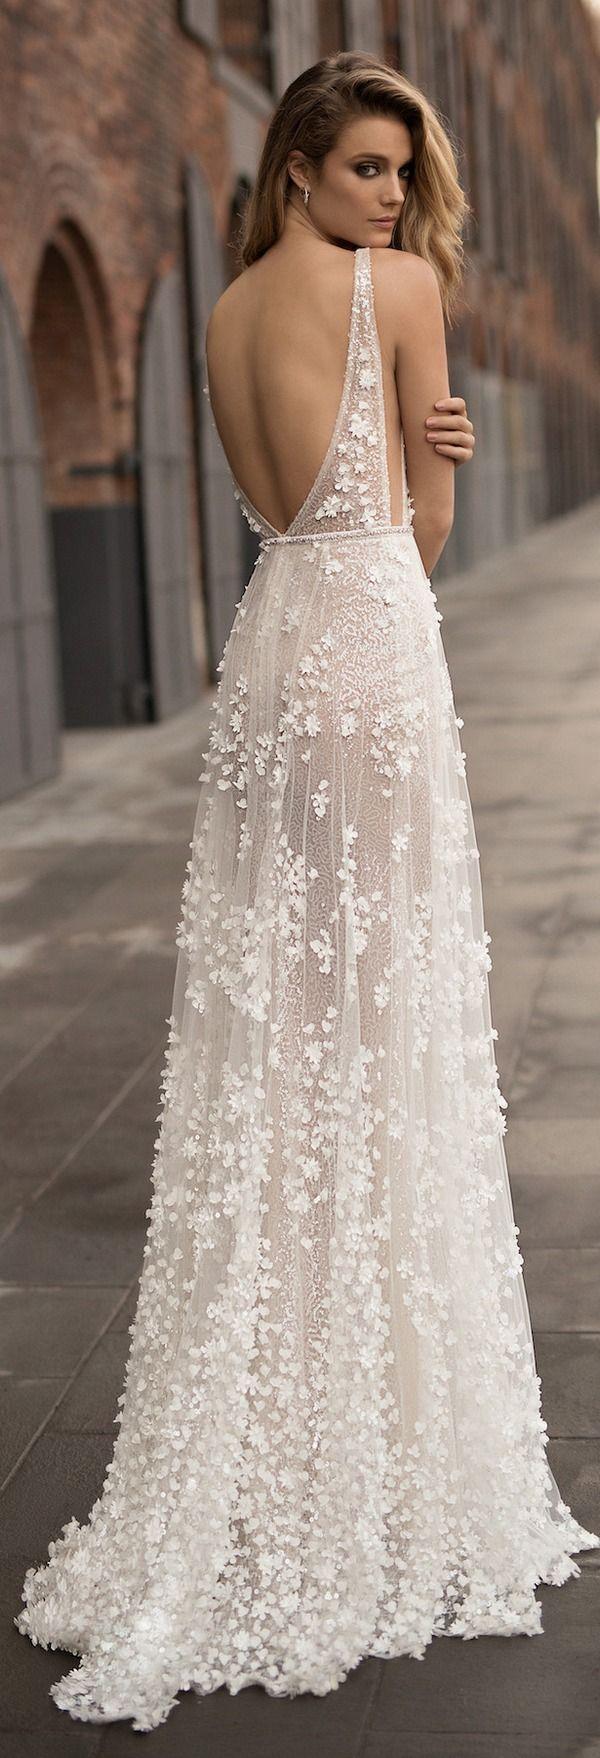 Lace wedding dress cheap december 2018 Wedding Ideas  Berta Spring Wedding Dresses   Dresses